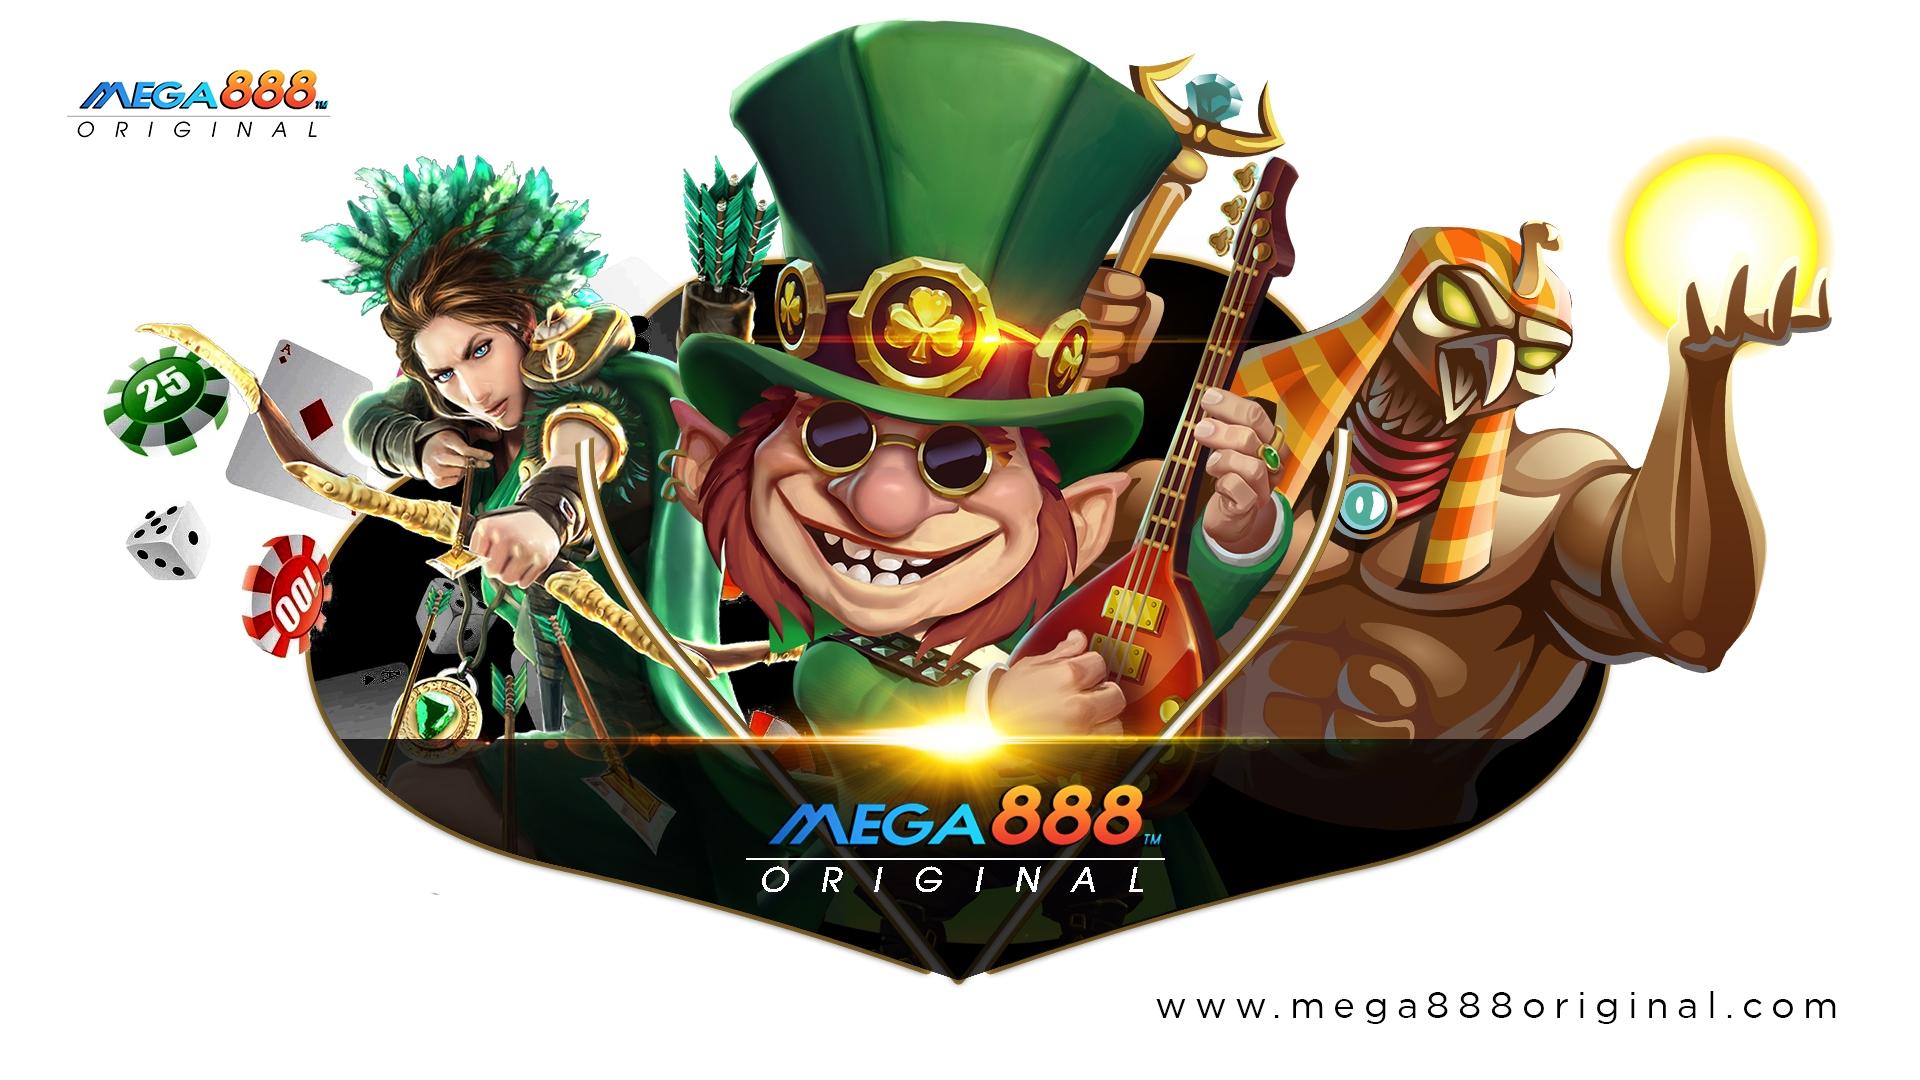 Mega888 Original (@mega888original) Cover Image